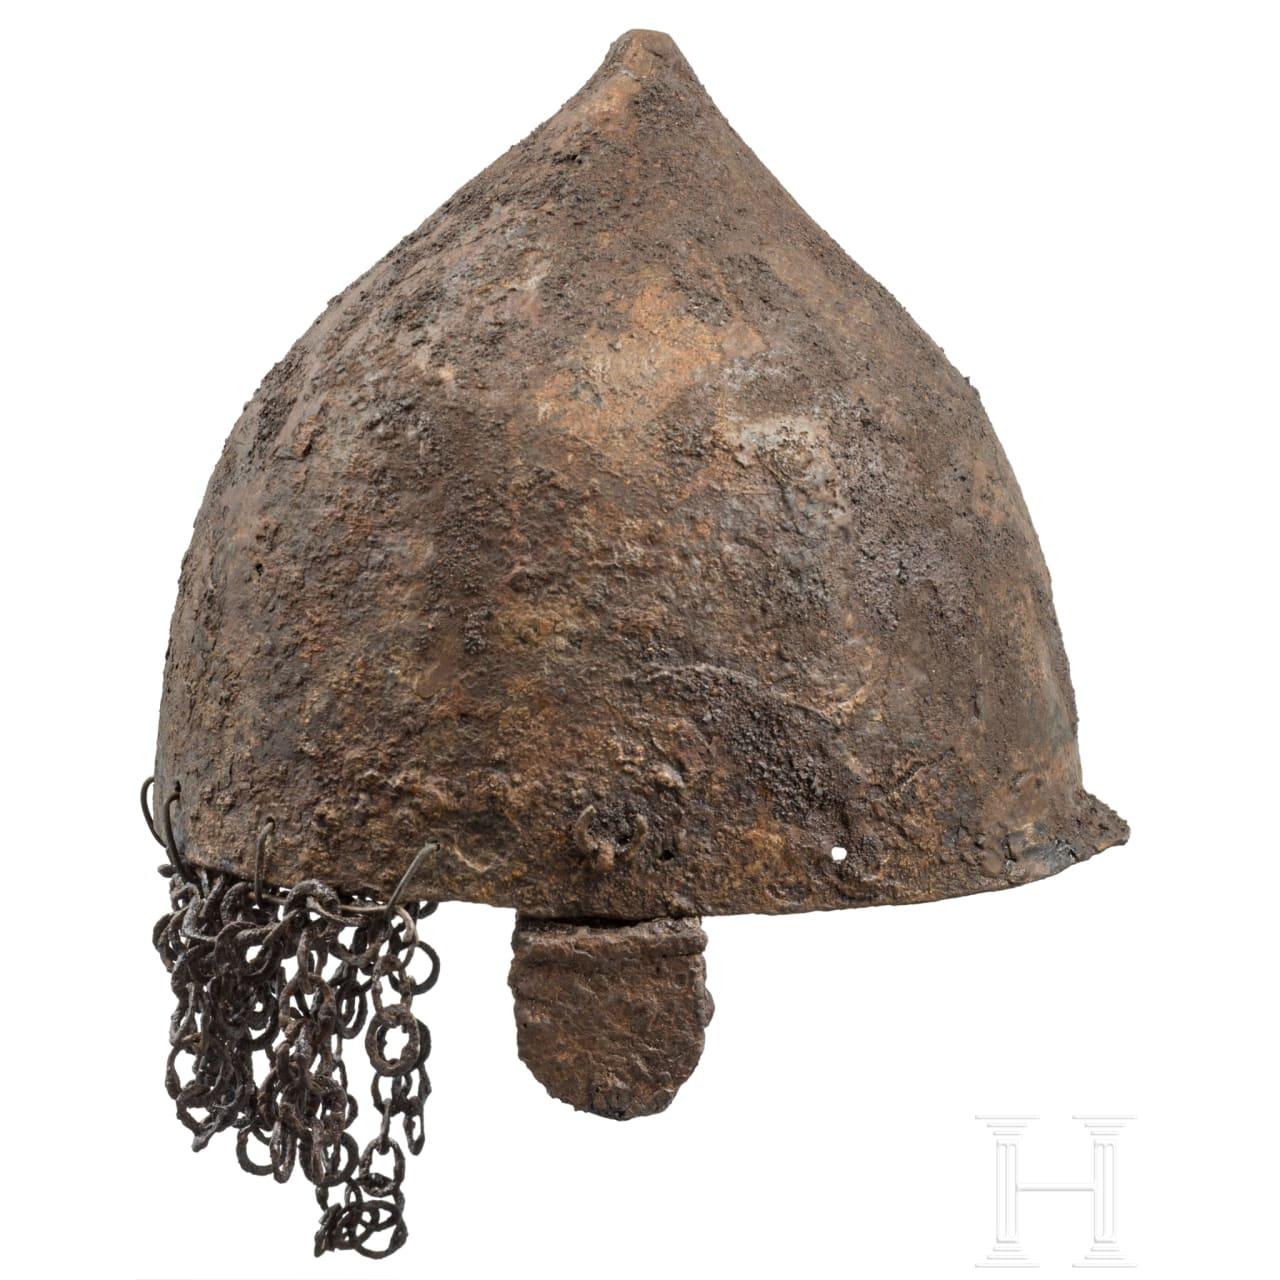 A Khasarianian iron helmet, 12th - 13th century